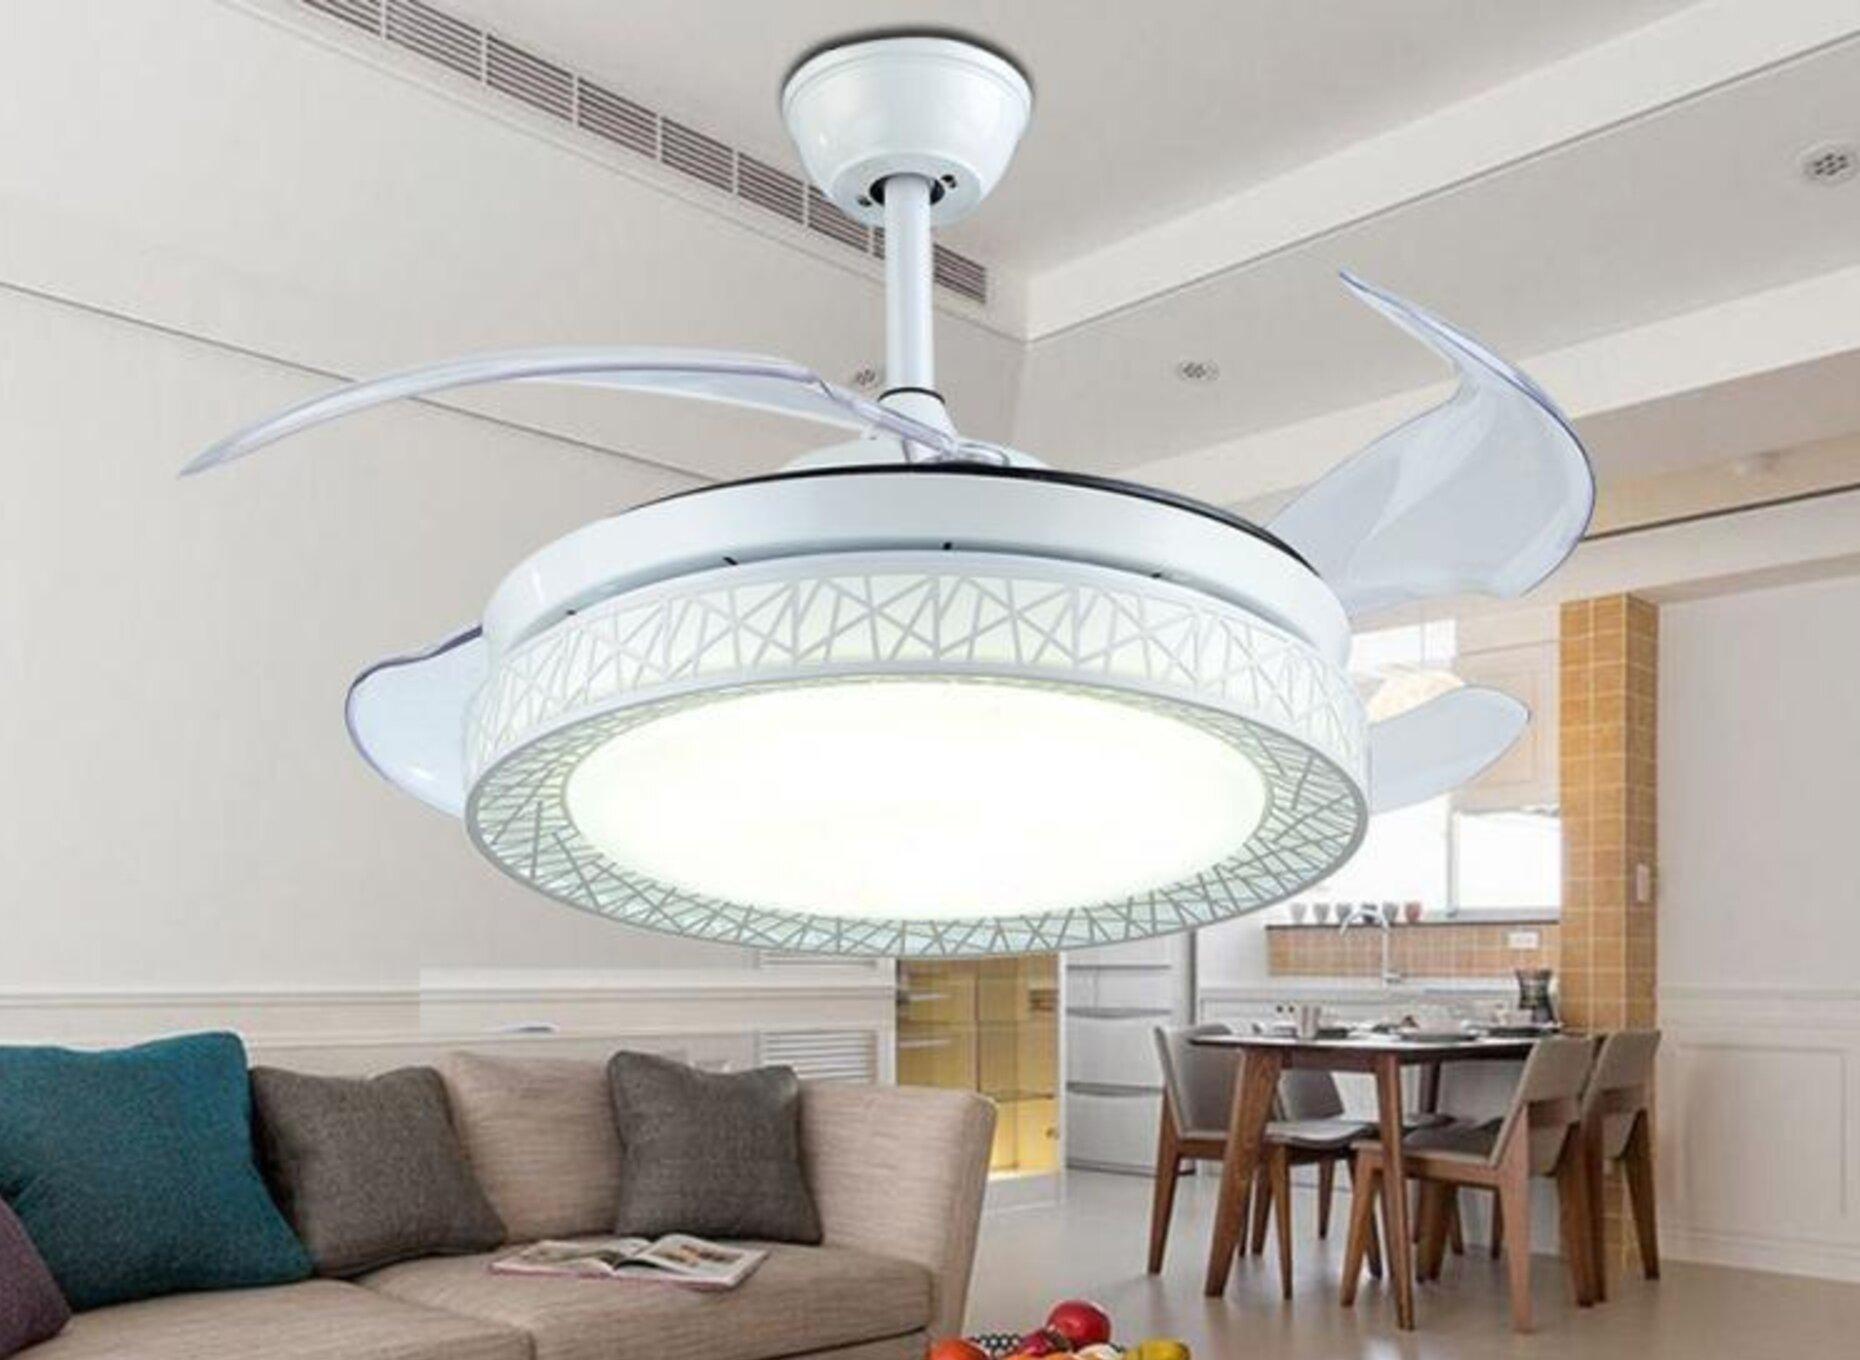 42 Lance 4 Blade Led Smart Ceiling Fan